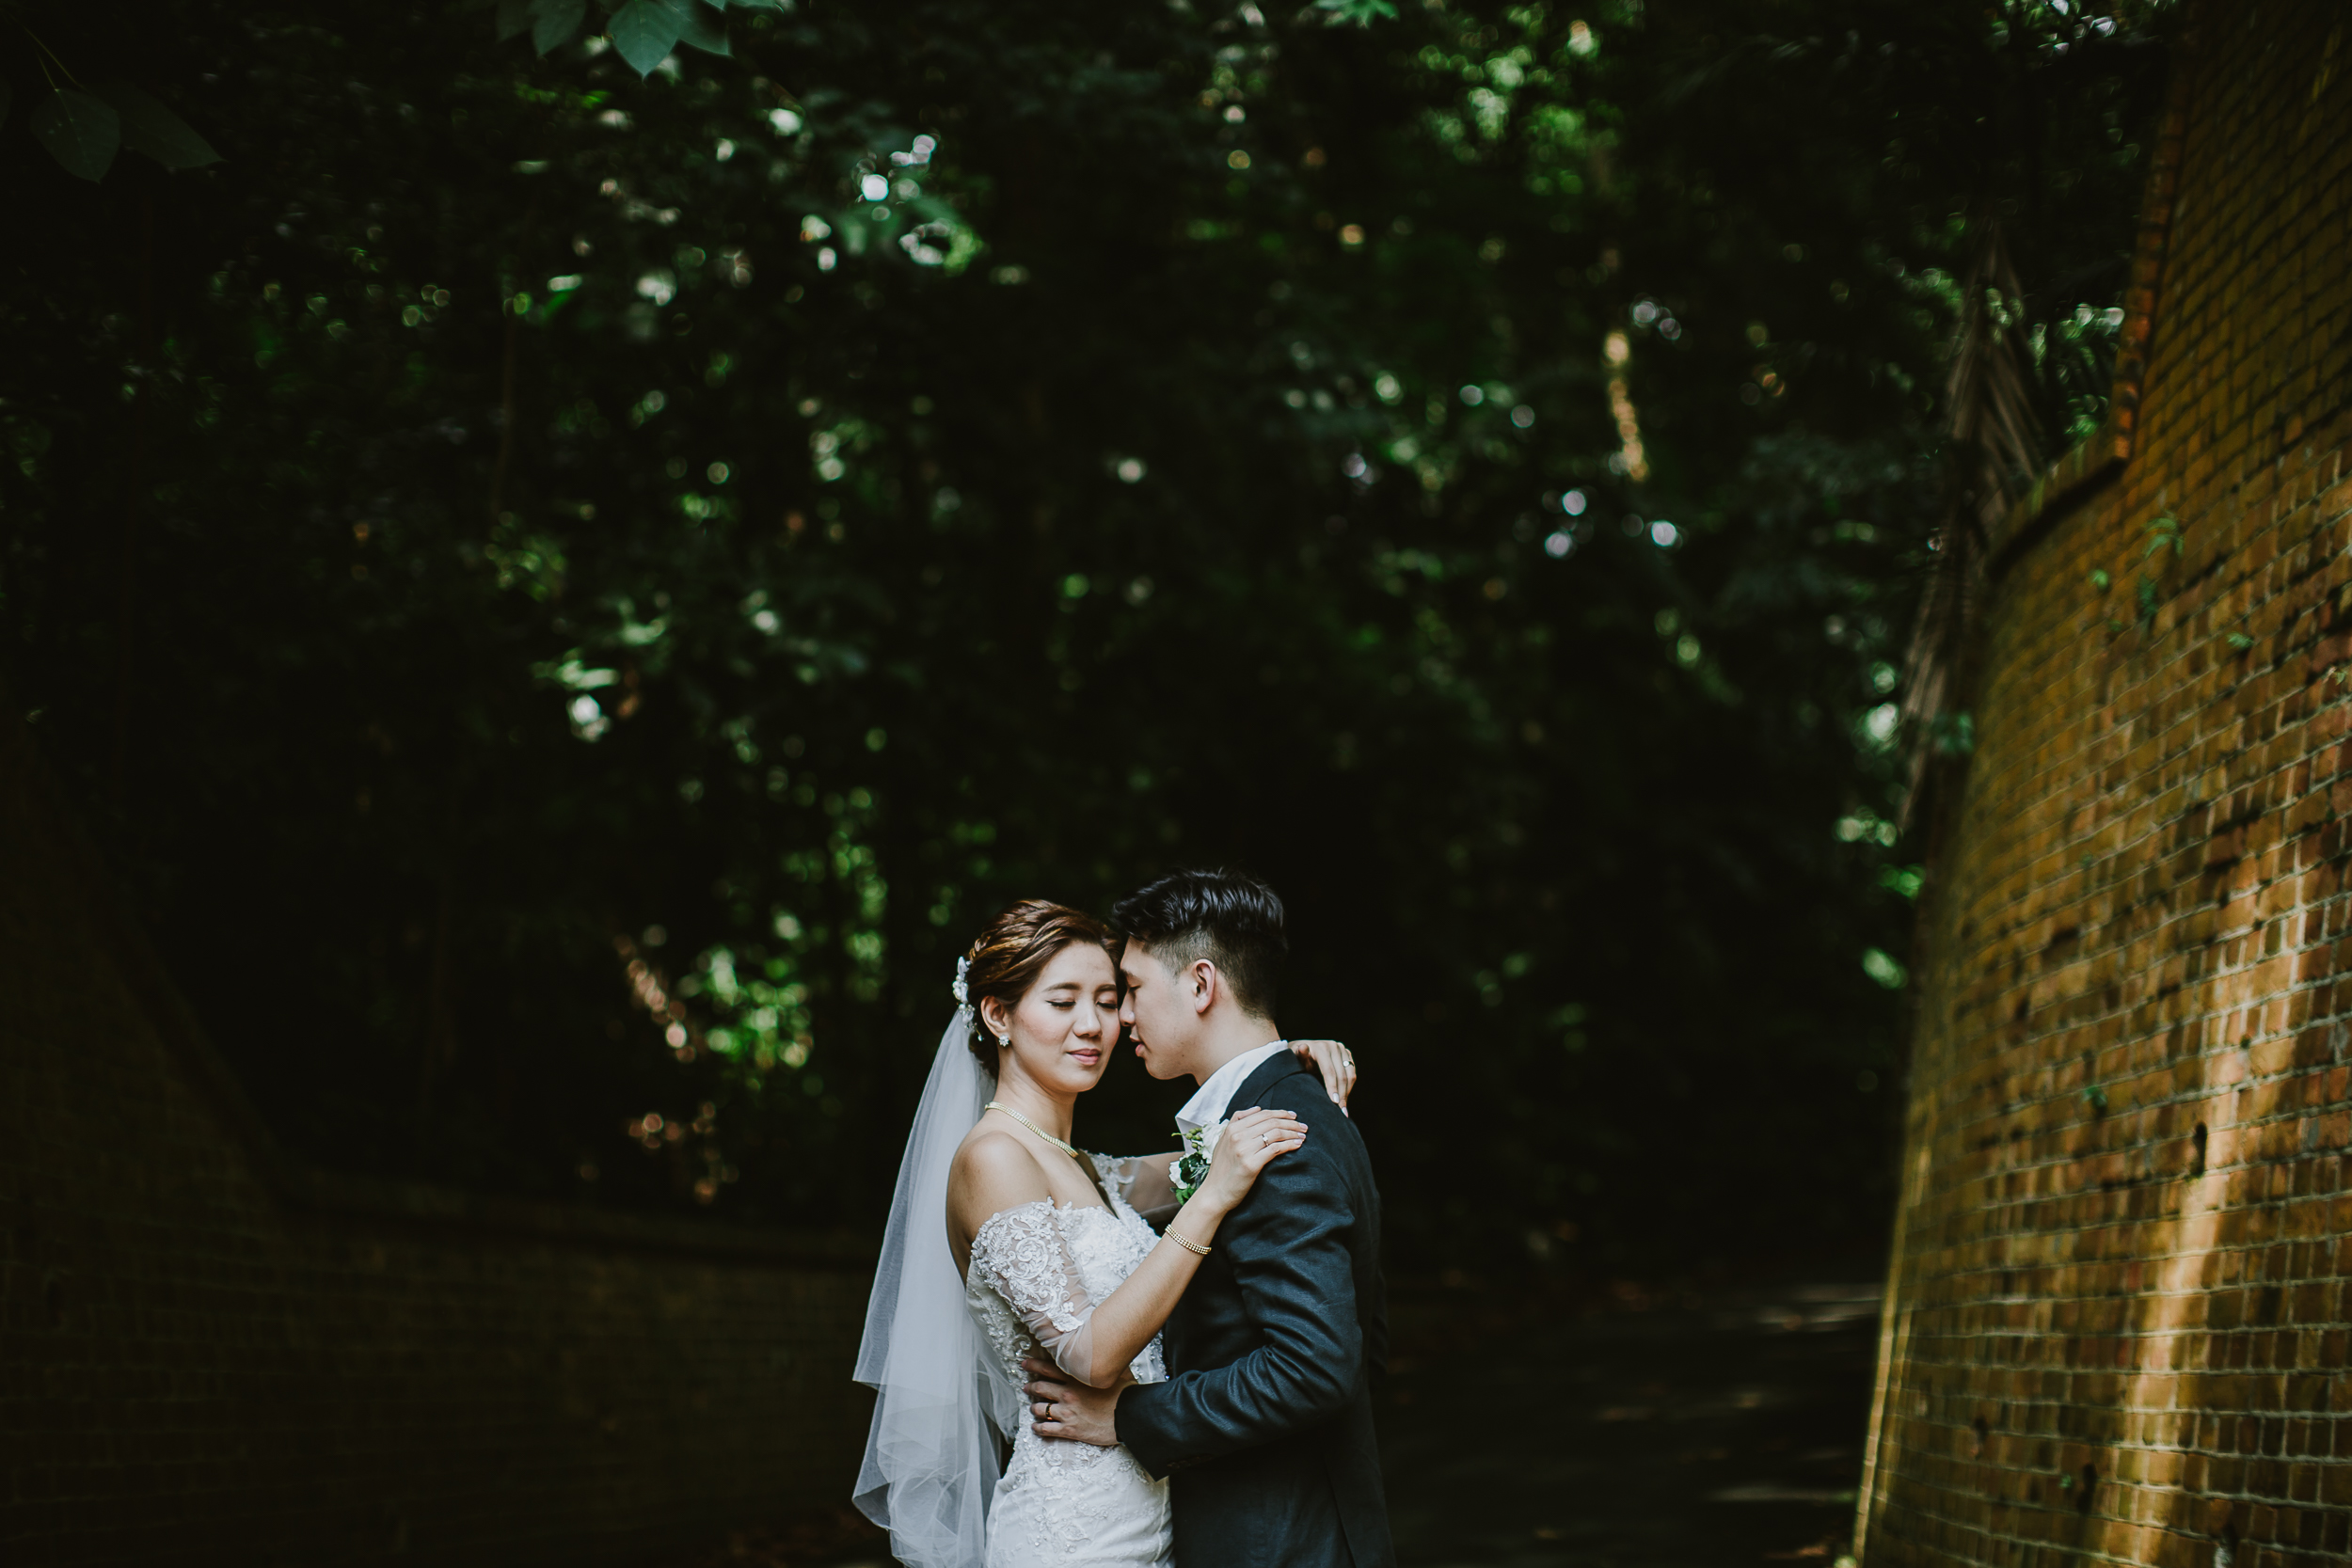 Singapore+Actual+Day+Wedding+Photographer+Raffles+Town+Club+Jeremiah+Christina-0063.jpg